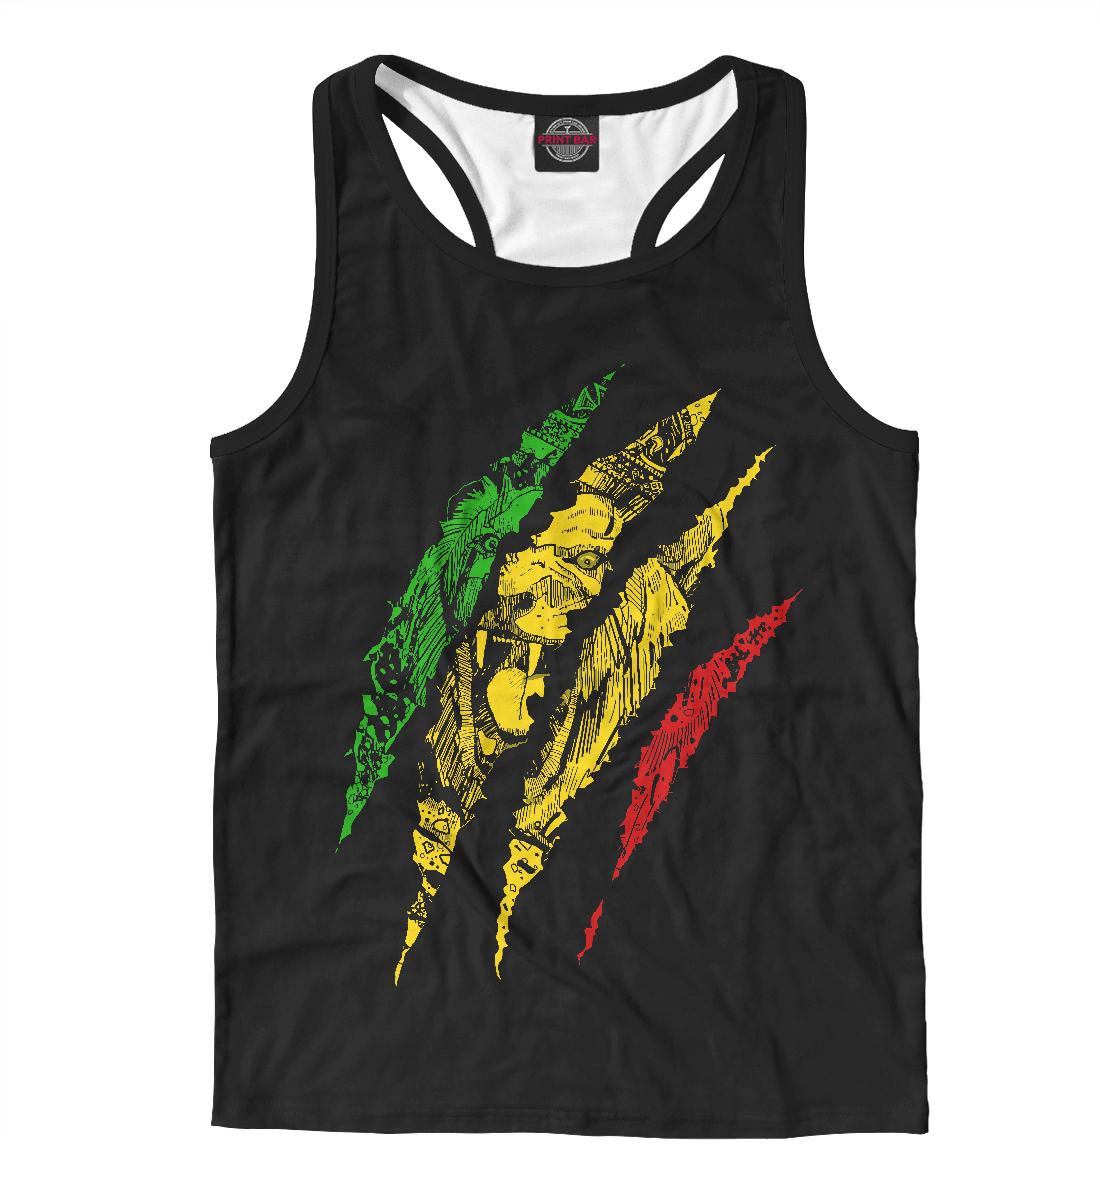 Jamaica Lion, Printbar, Майки борцовки, HIS-240342-mayb-2  - купить со скидкой